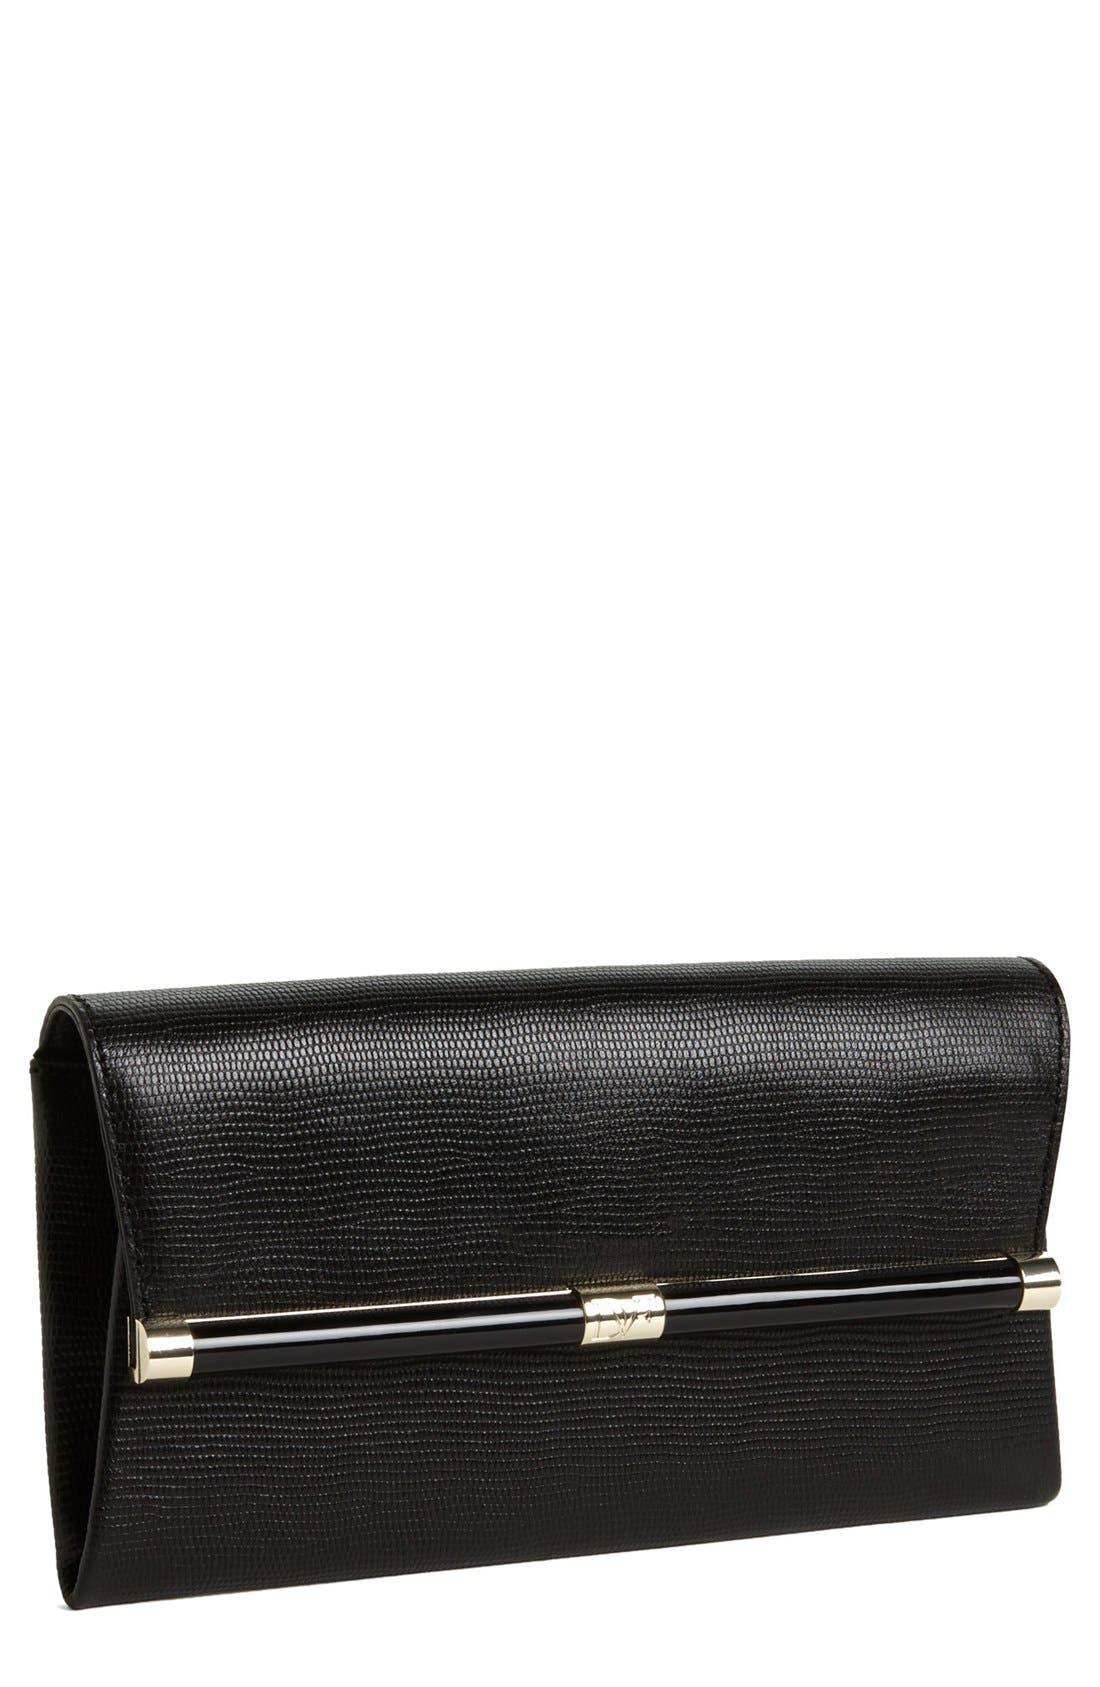 '440' Leather Envelope Clutch, Main, color, 002